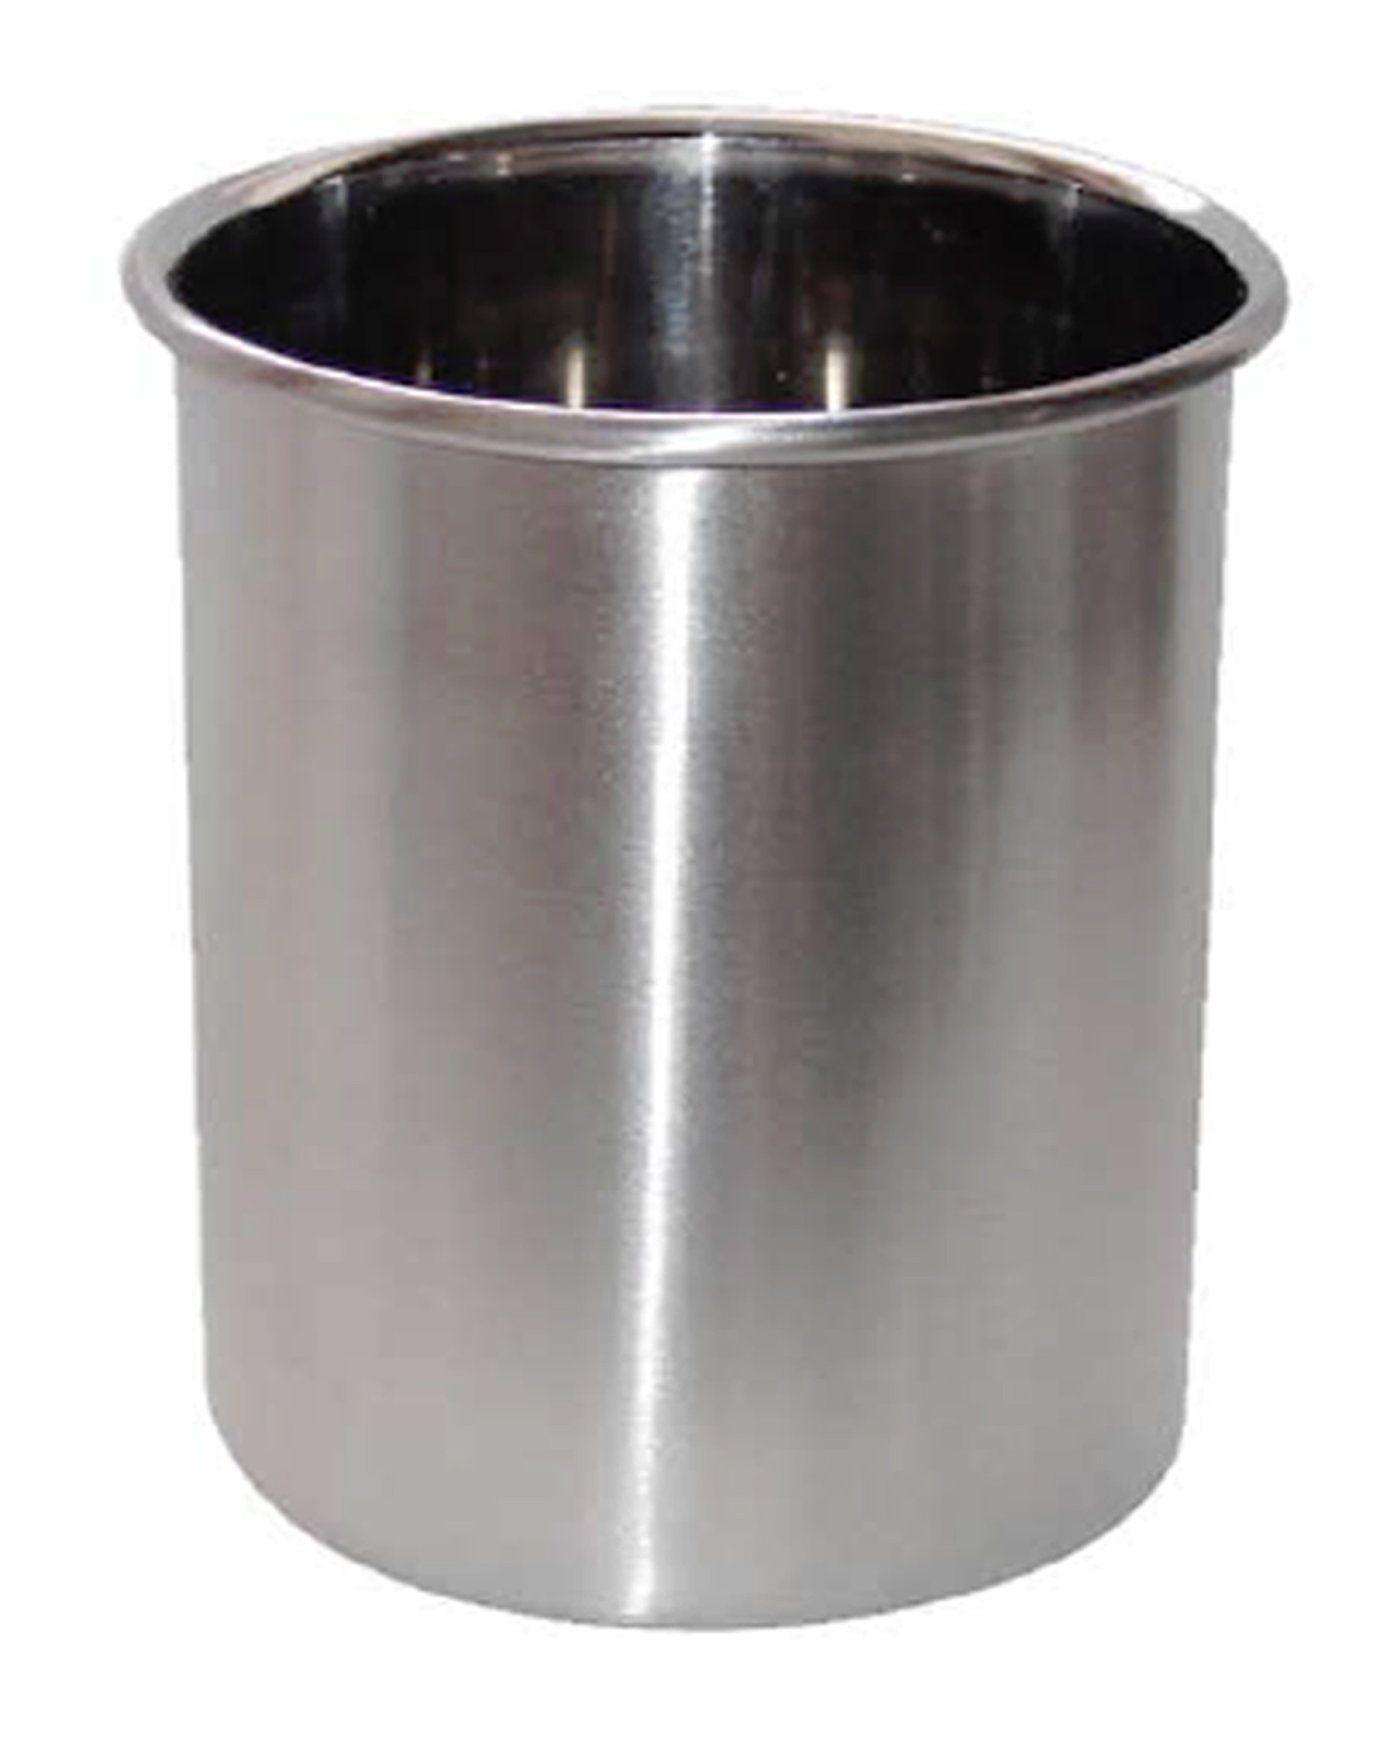 Stainless Steel Utensil Crock